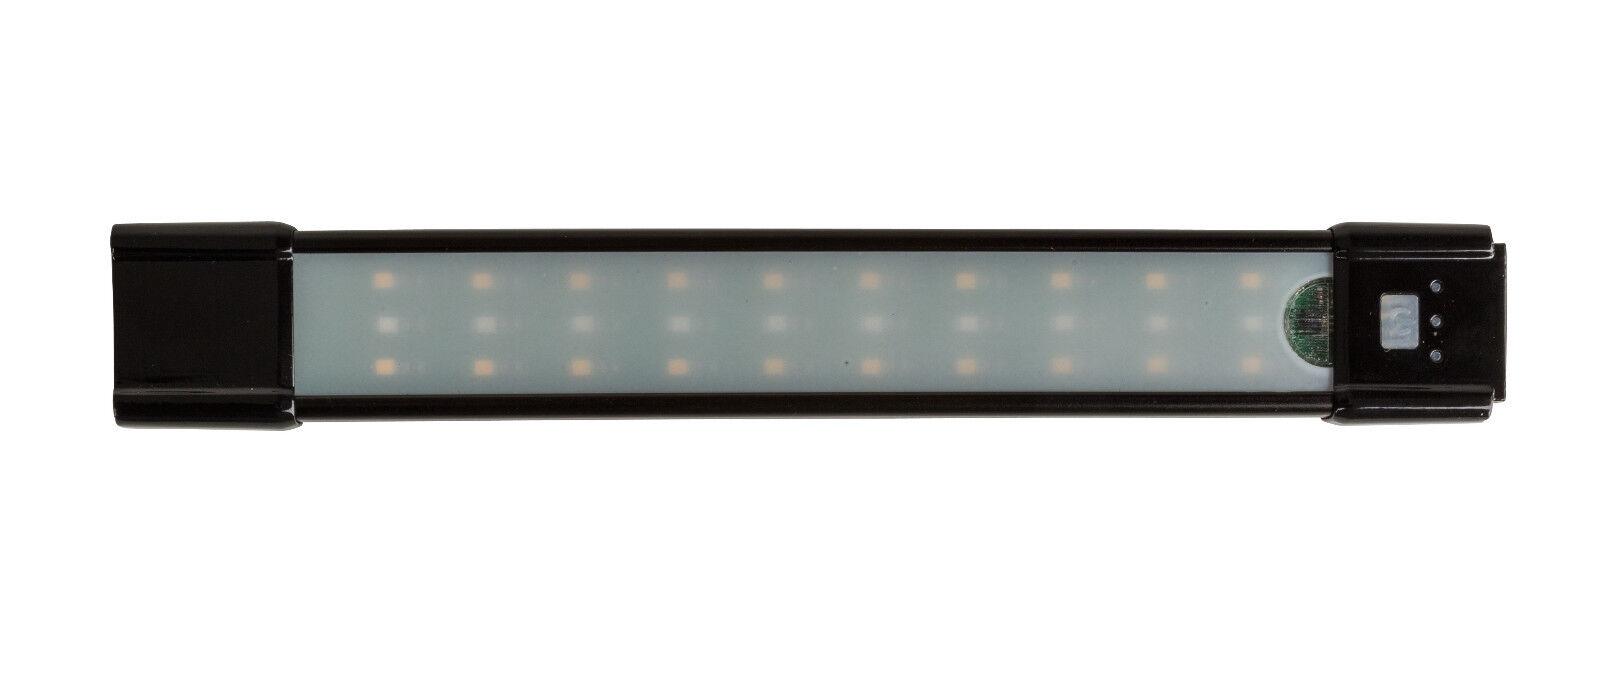 Chub Sat-A-Lite Bivvy Light RC Deluxe 1436486 Zeltlampe Taschenlampe Lampe Lamp